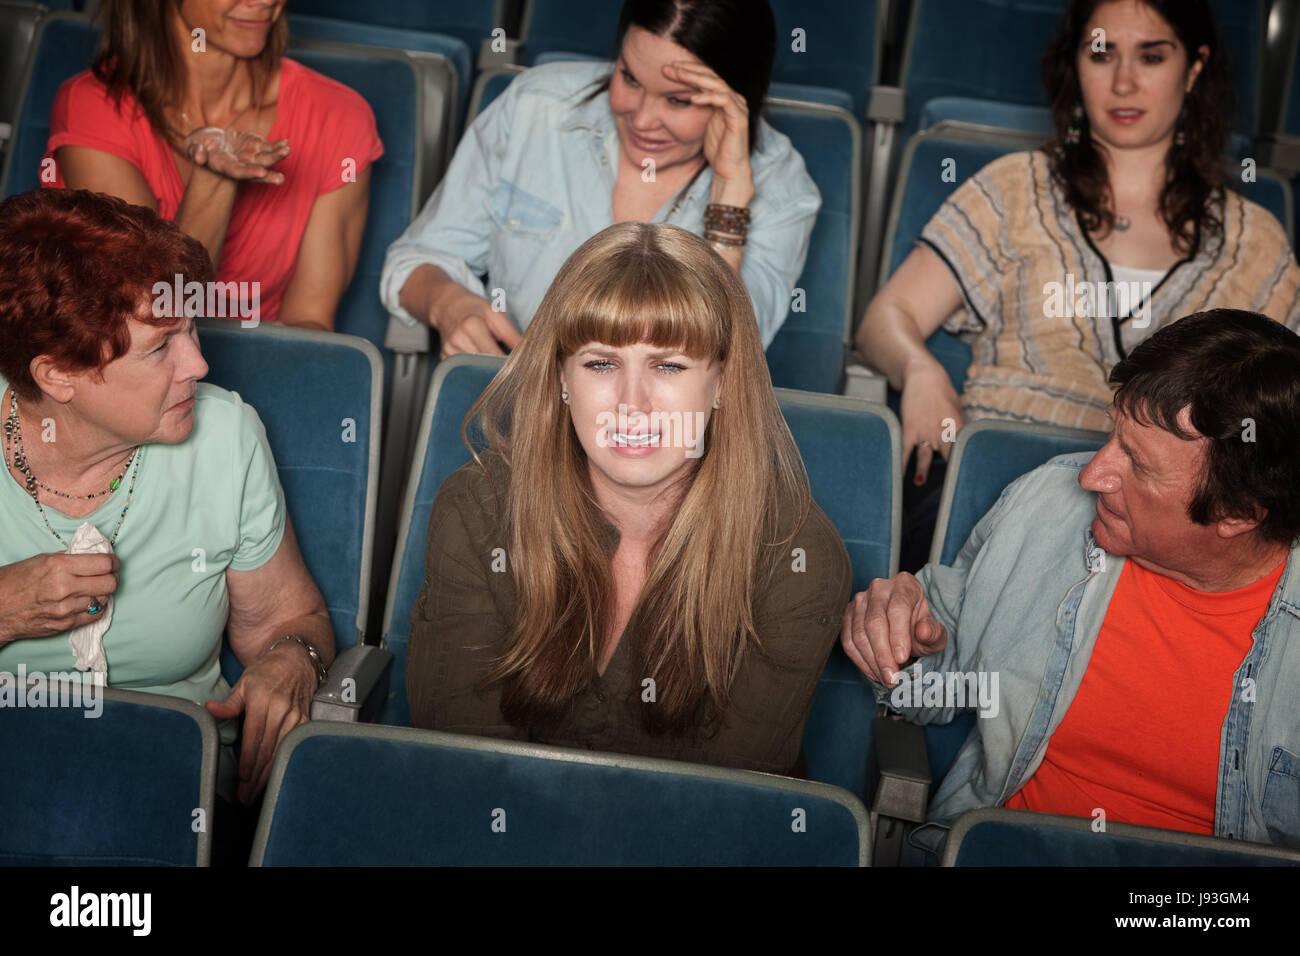 blank, european, caucasian, chairs, cinema, crowd, casserole, audience, humans, - Stock Image